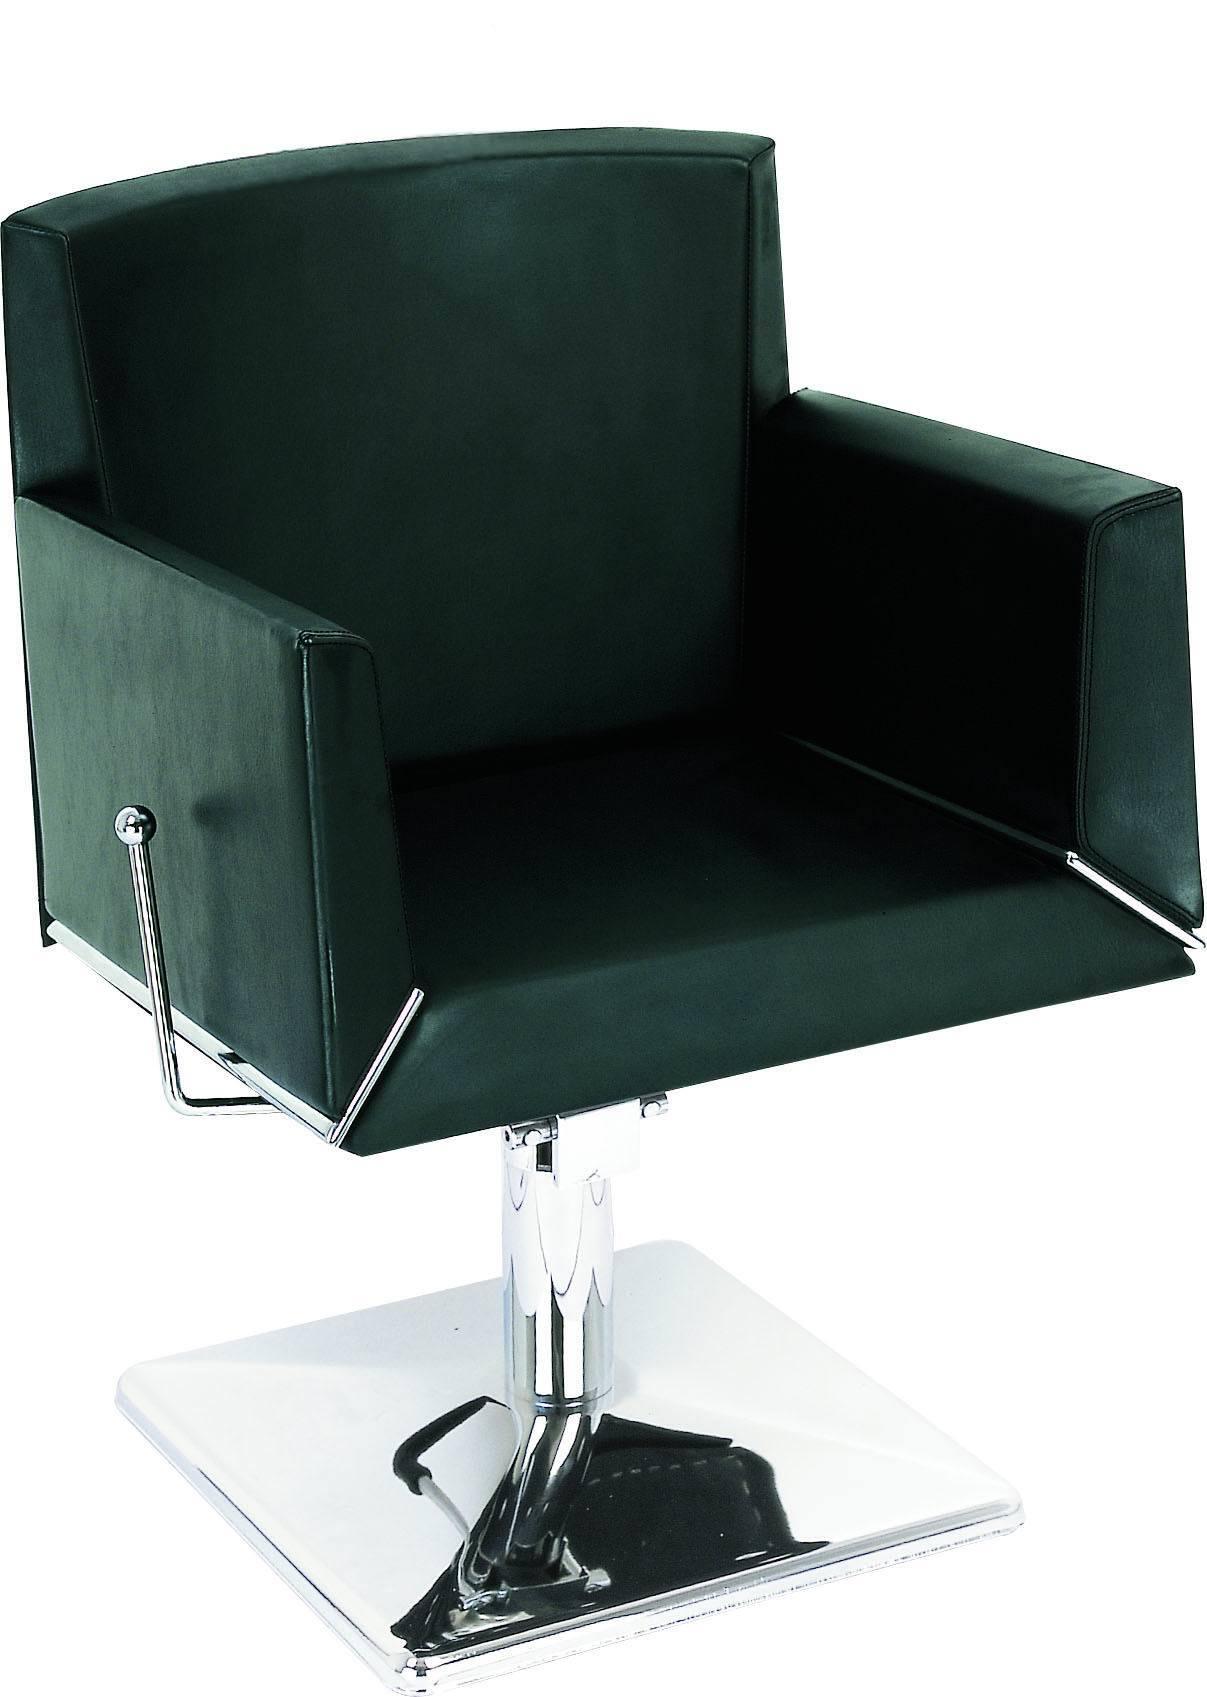 China Hydraulic Salon Chair (LY6373)